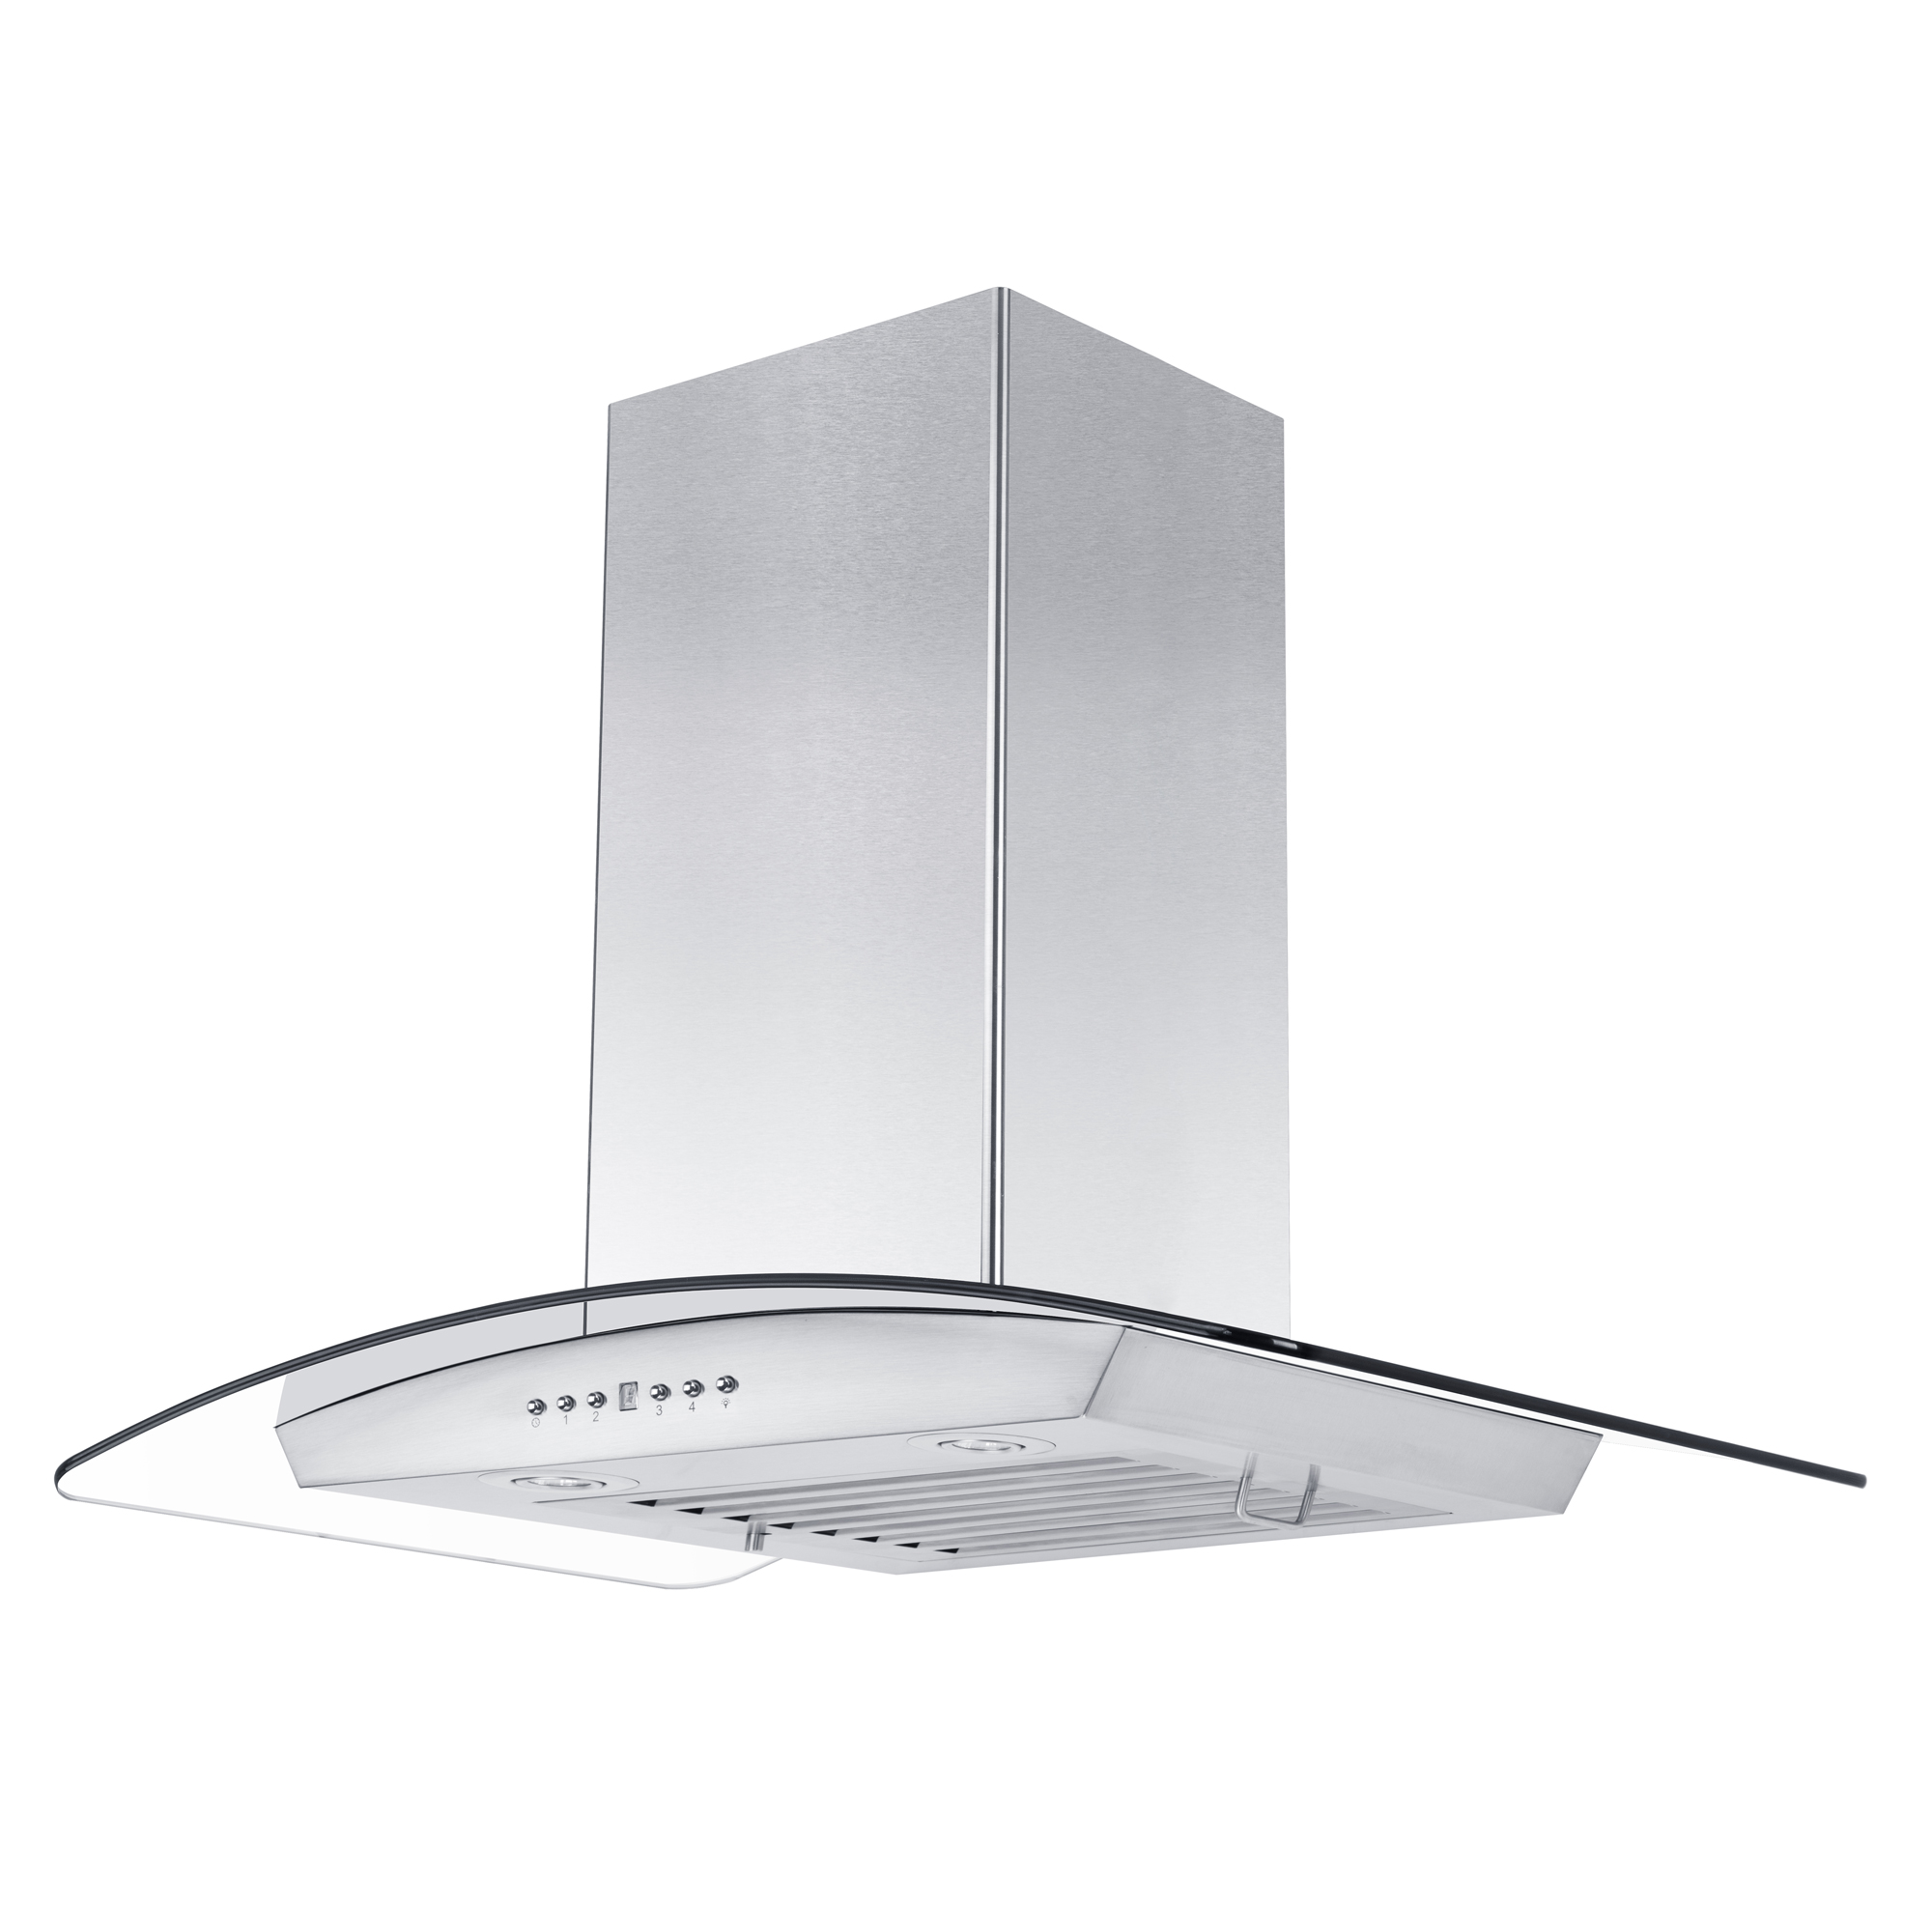 zline-stainless-steel-wall-mounted-range-hood-KZ-new-side-under.jpg